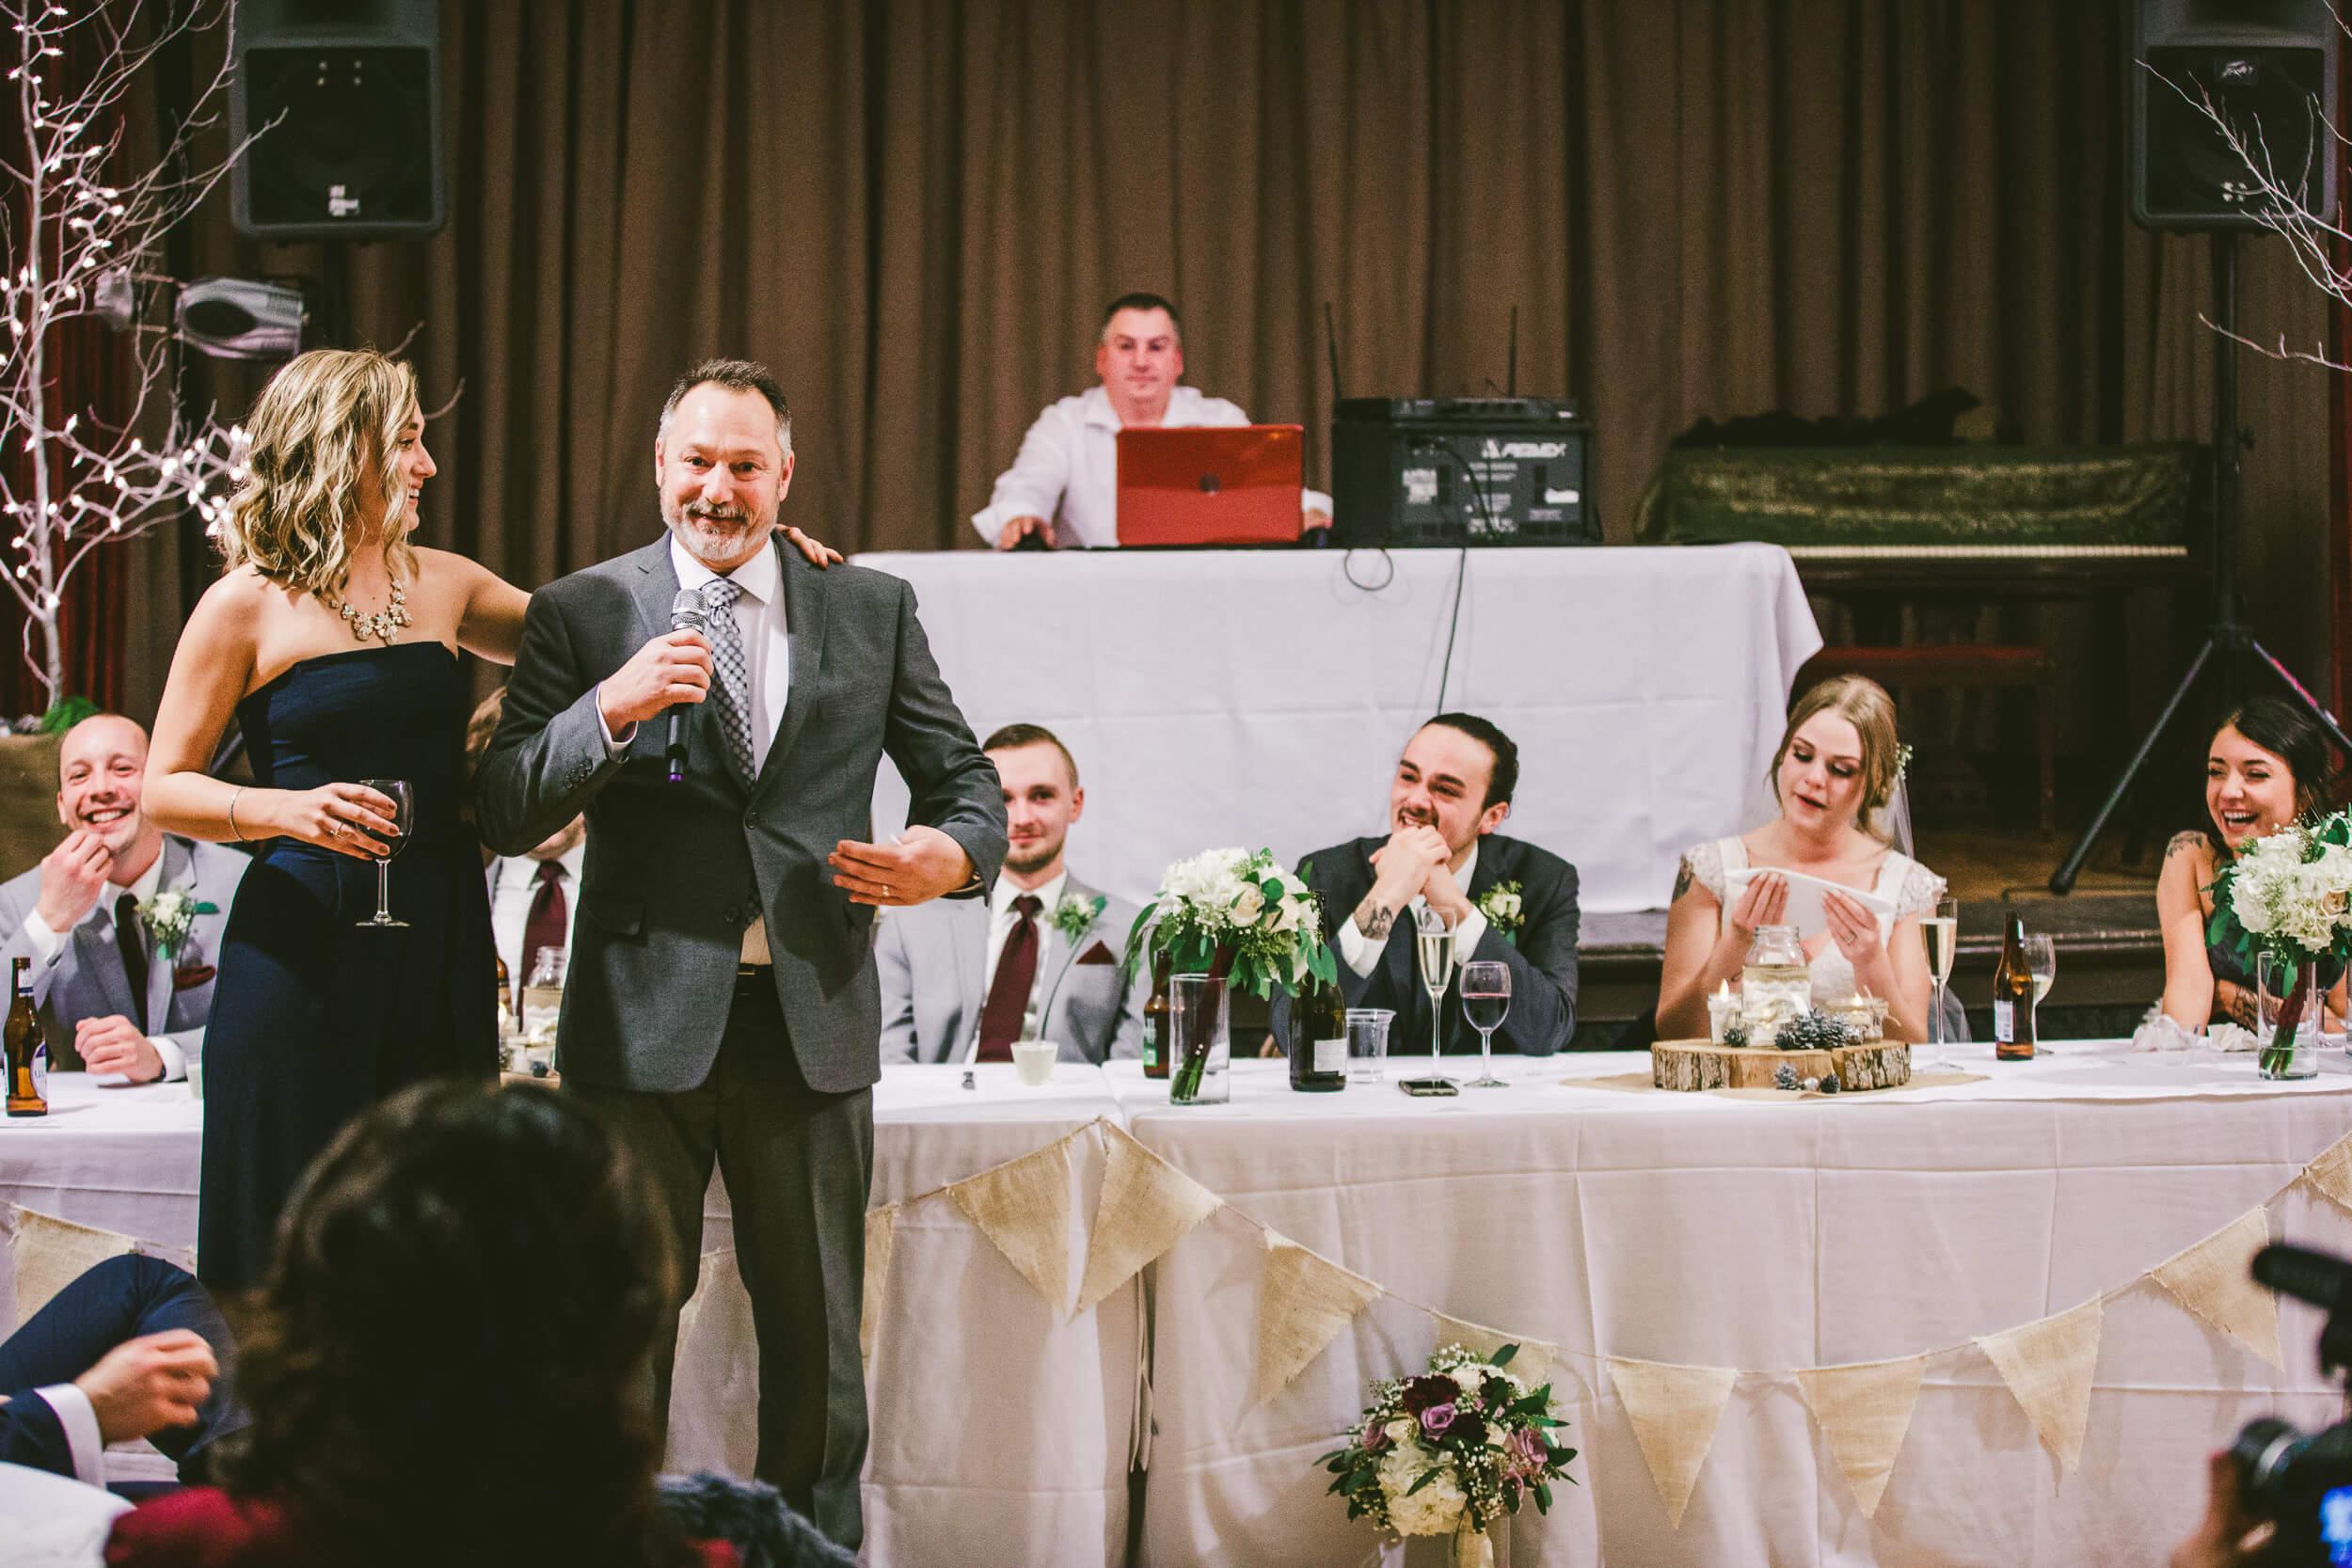 mukogawa winter wedding in spokane (258).jpg